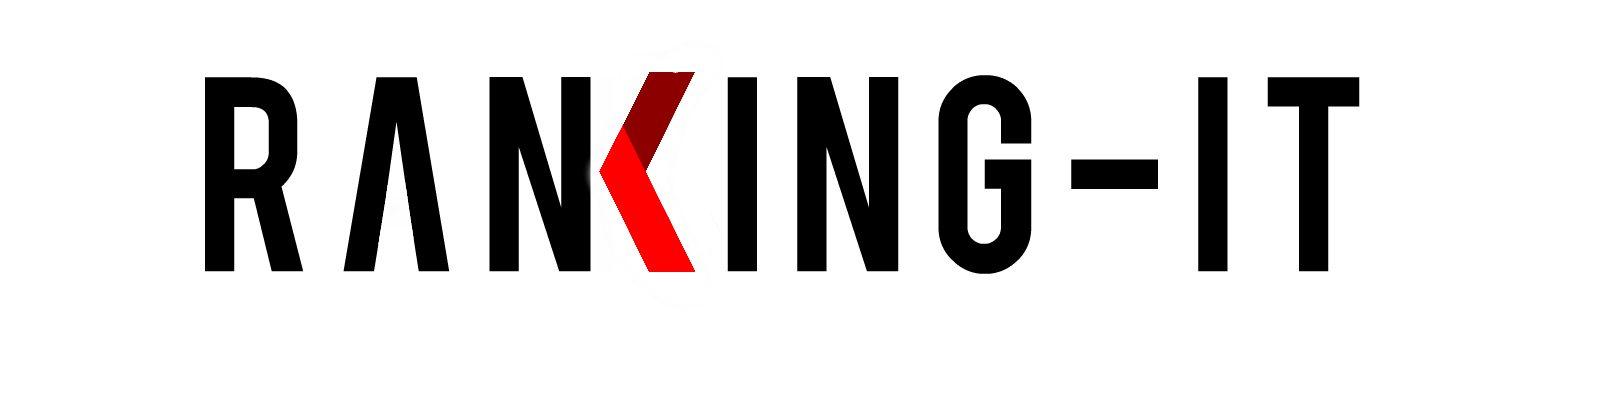 Ranking-IT